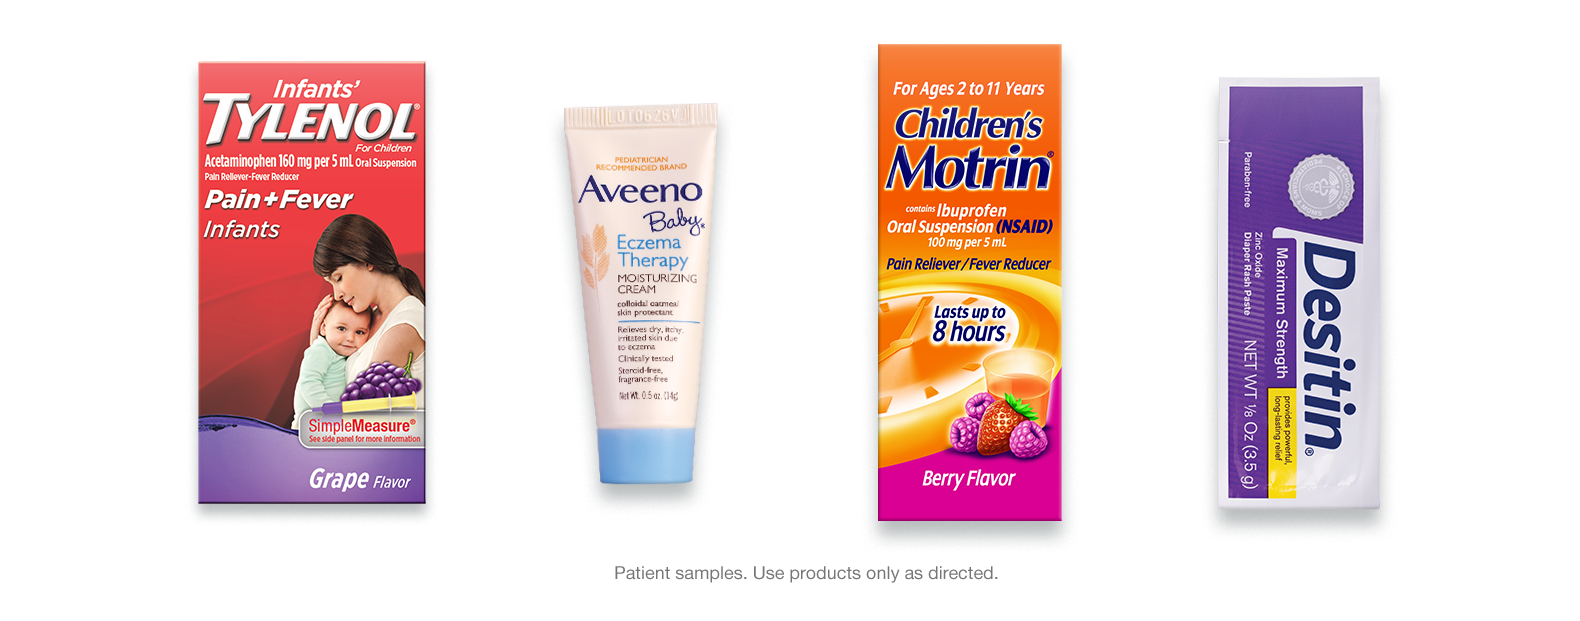 Motrin® dosage & samples   johnson & johnson pediatrics.